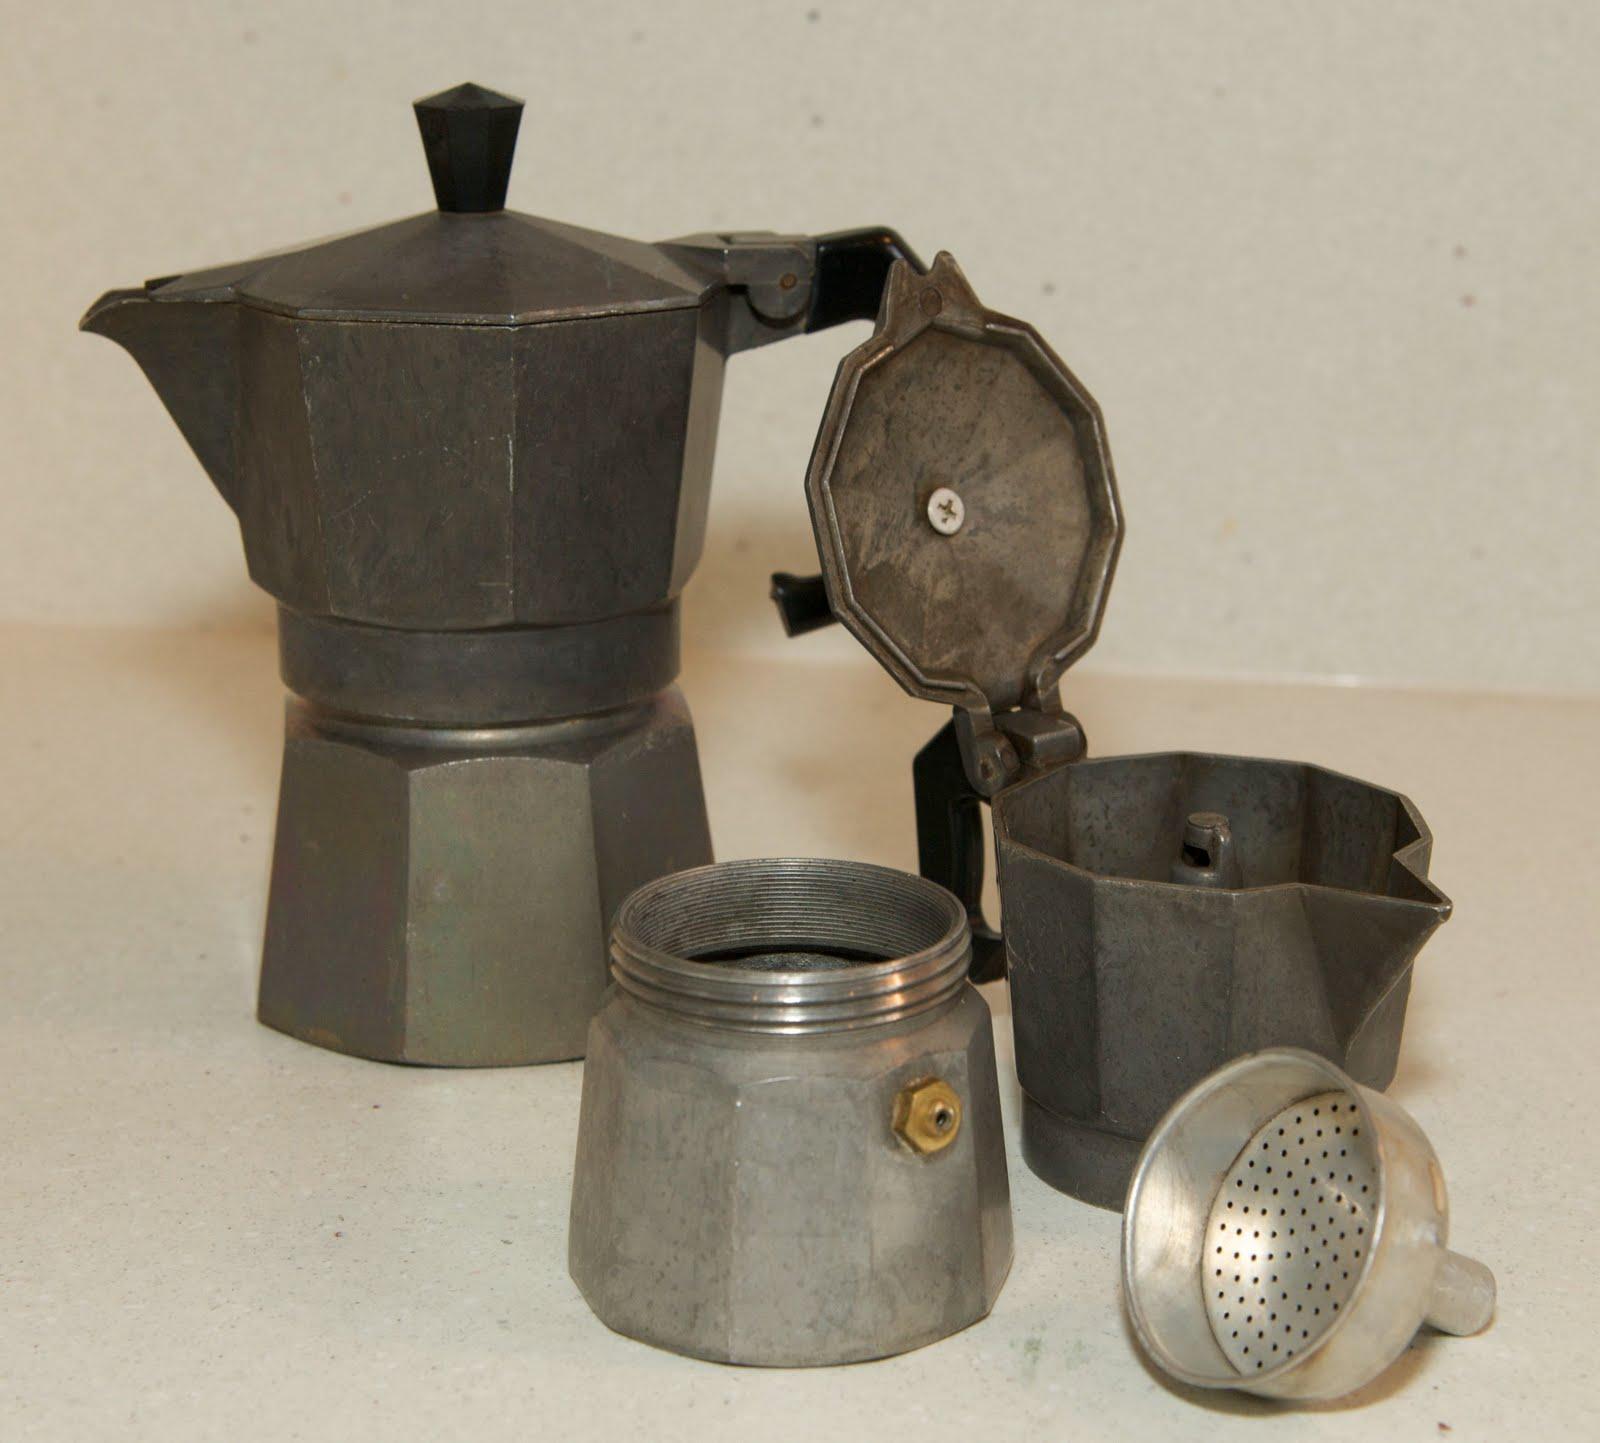 Cuban Coffee Instructions